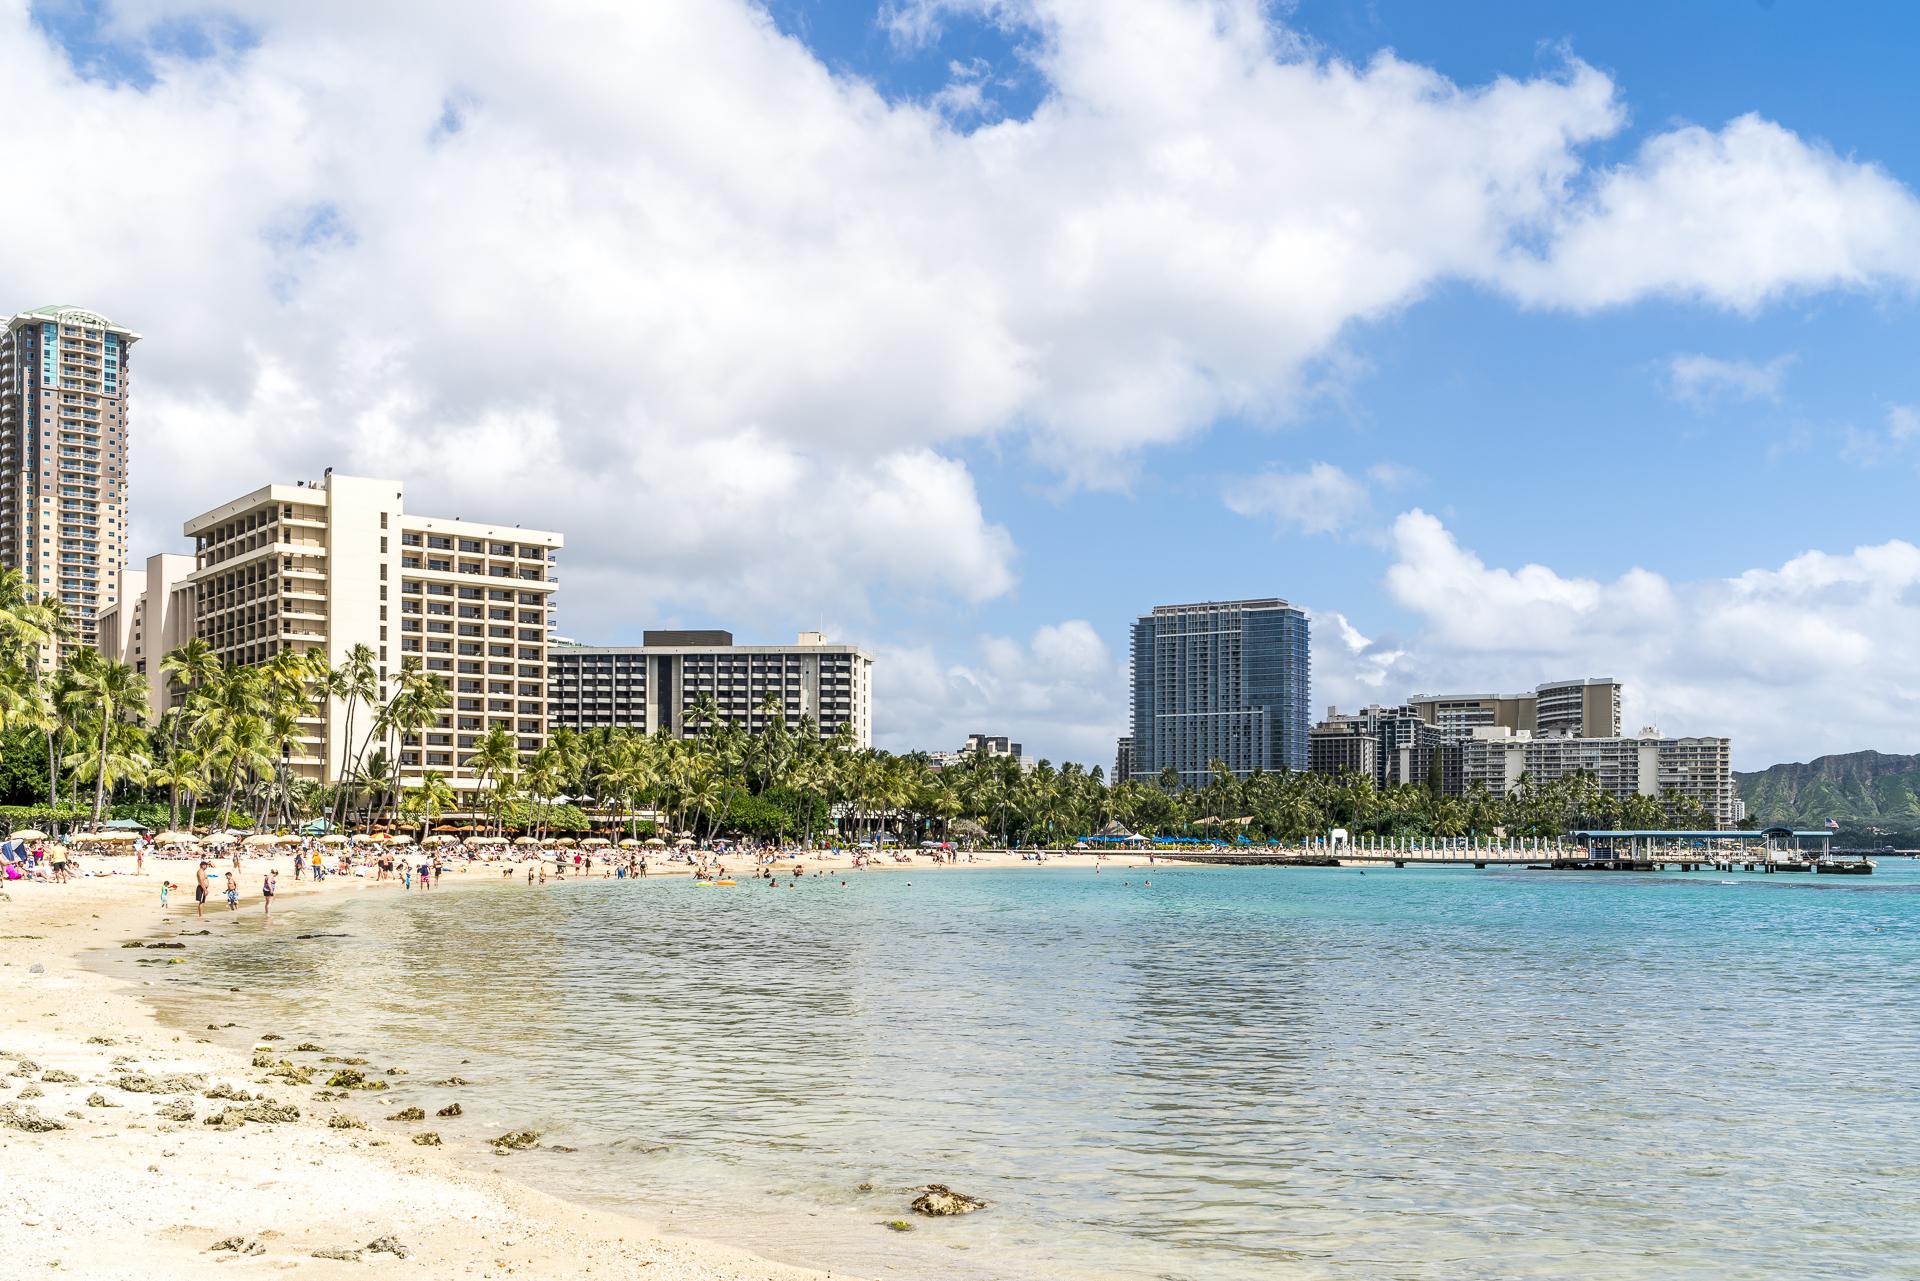 Honolulu-Waikiki-Strand